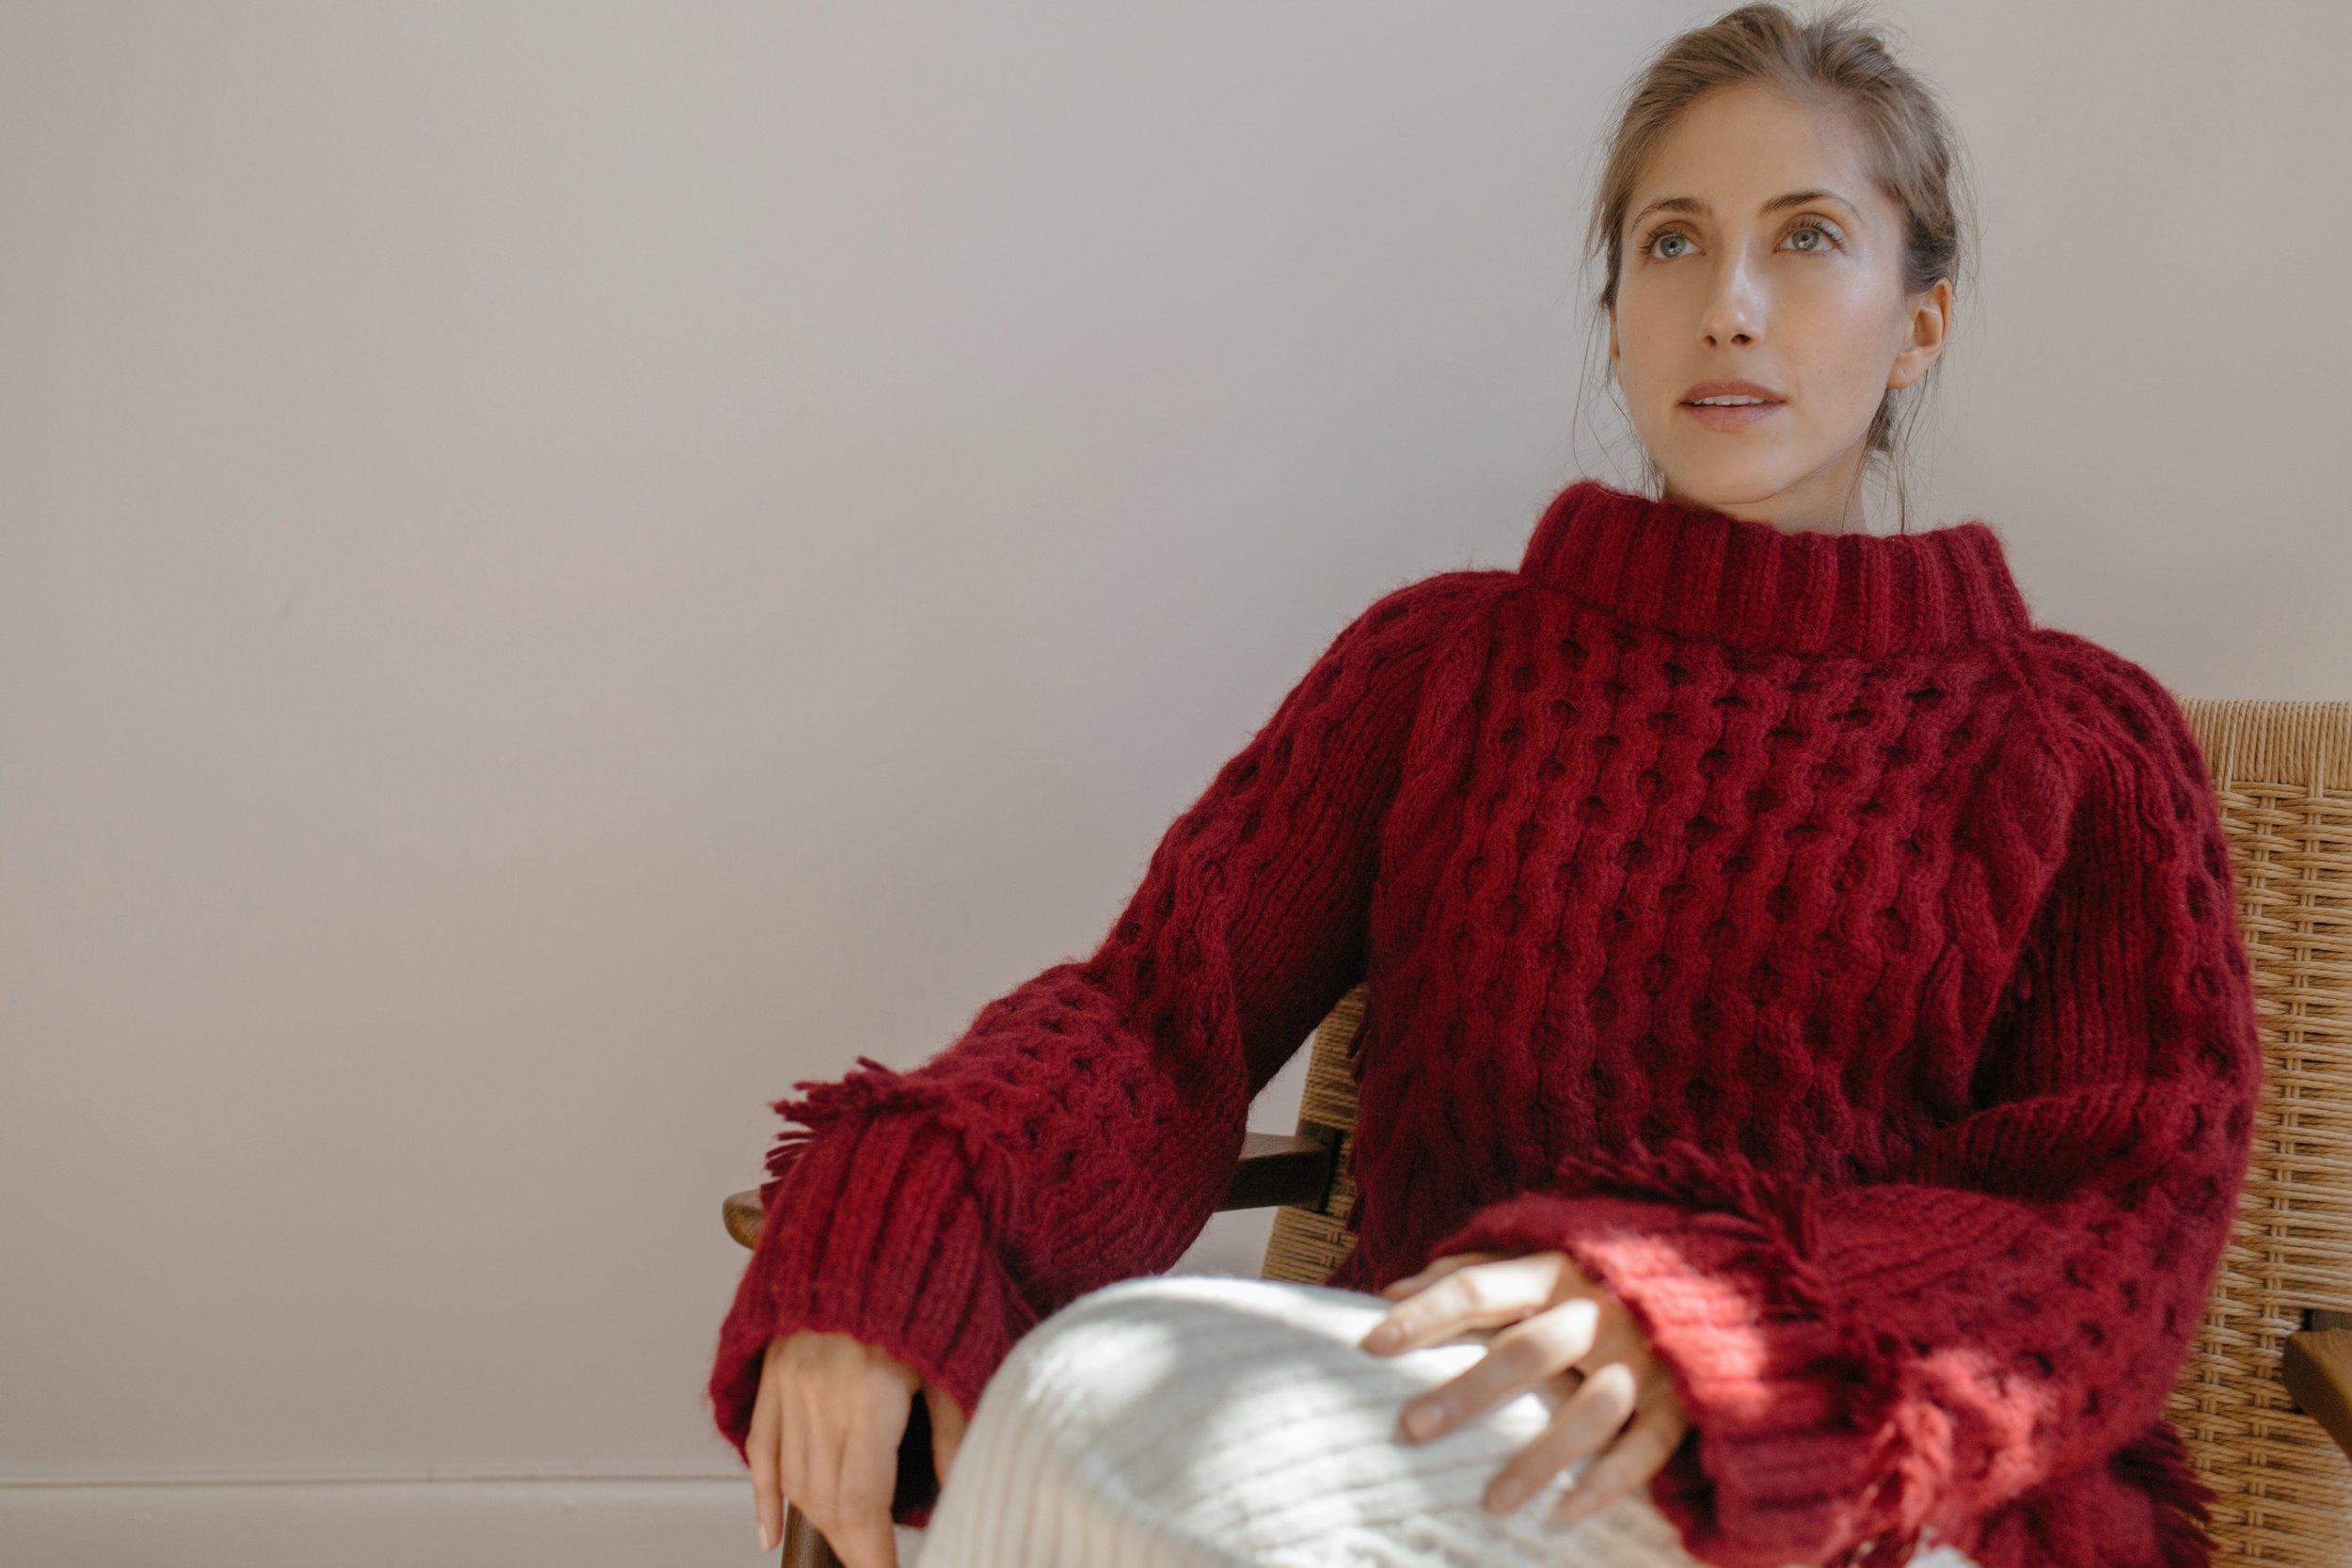 Jenna wears  Lorena sweater hand-knit in Claret and  Lilliana sweater skirt  in cream | Made in baby alpaca yarns in Peru, with LOVE